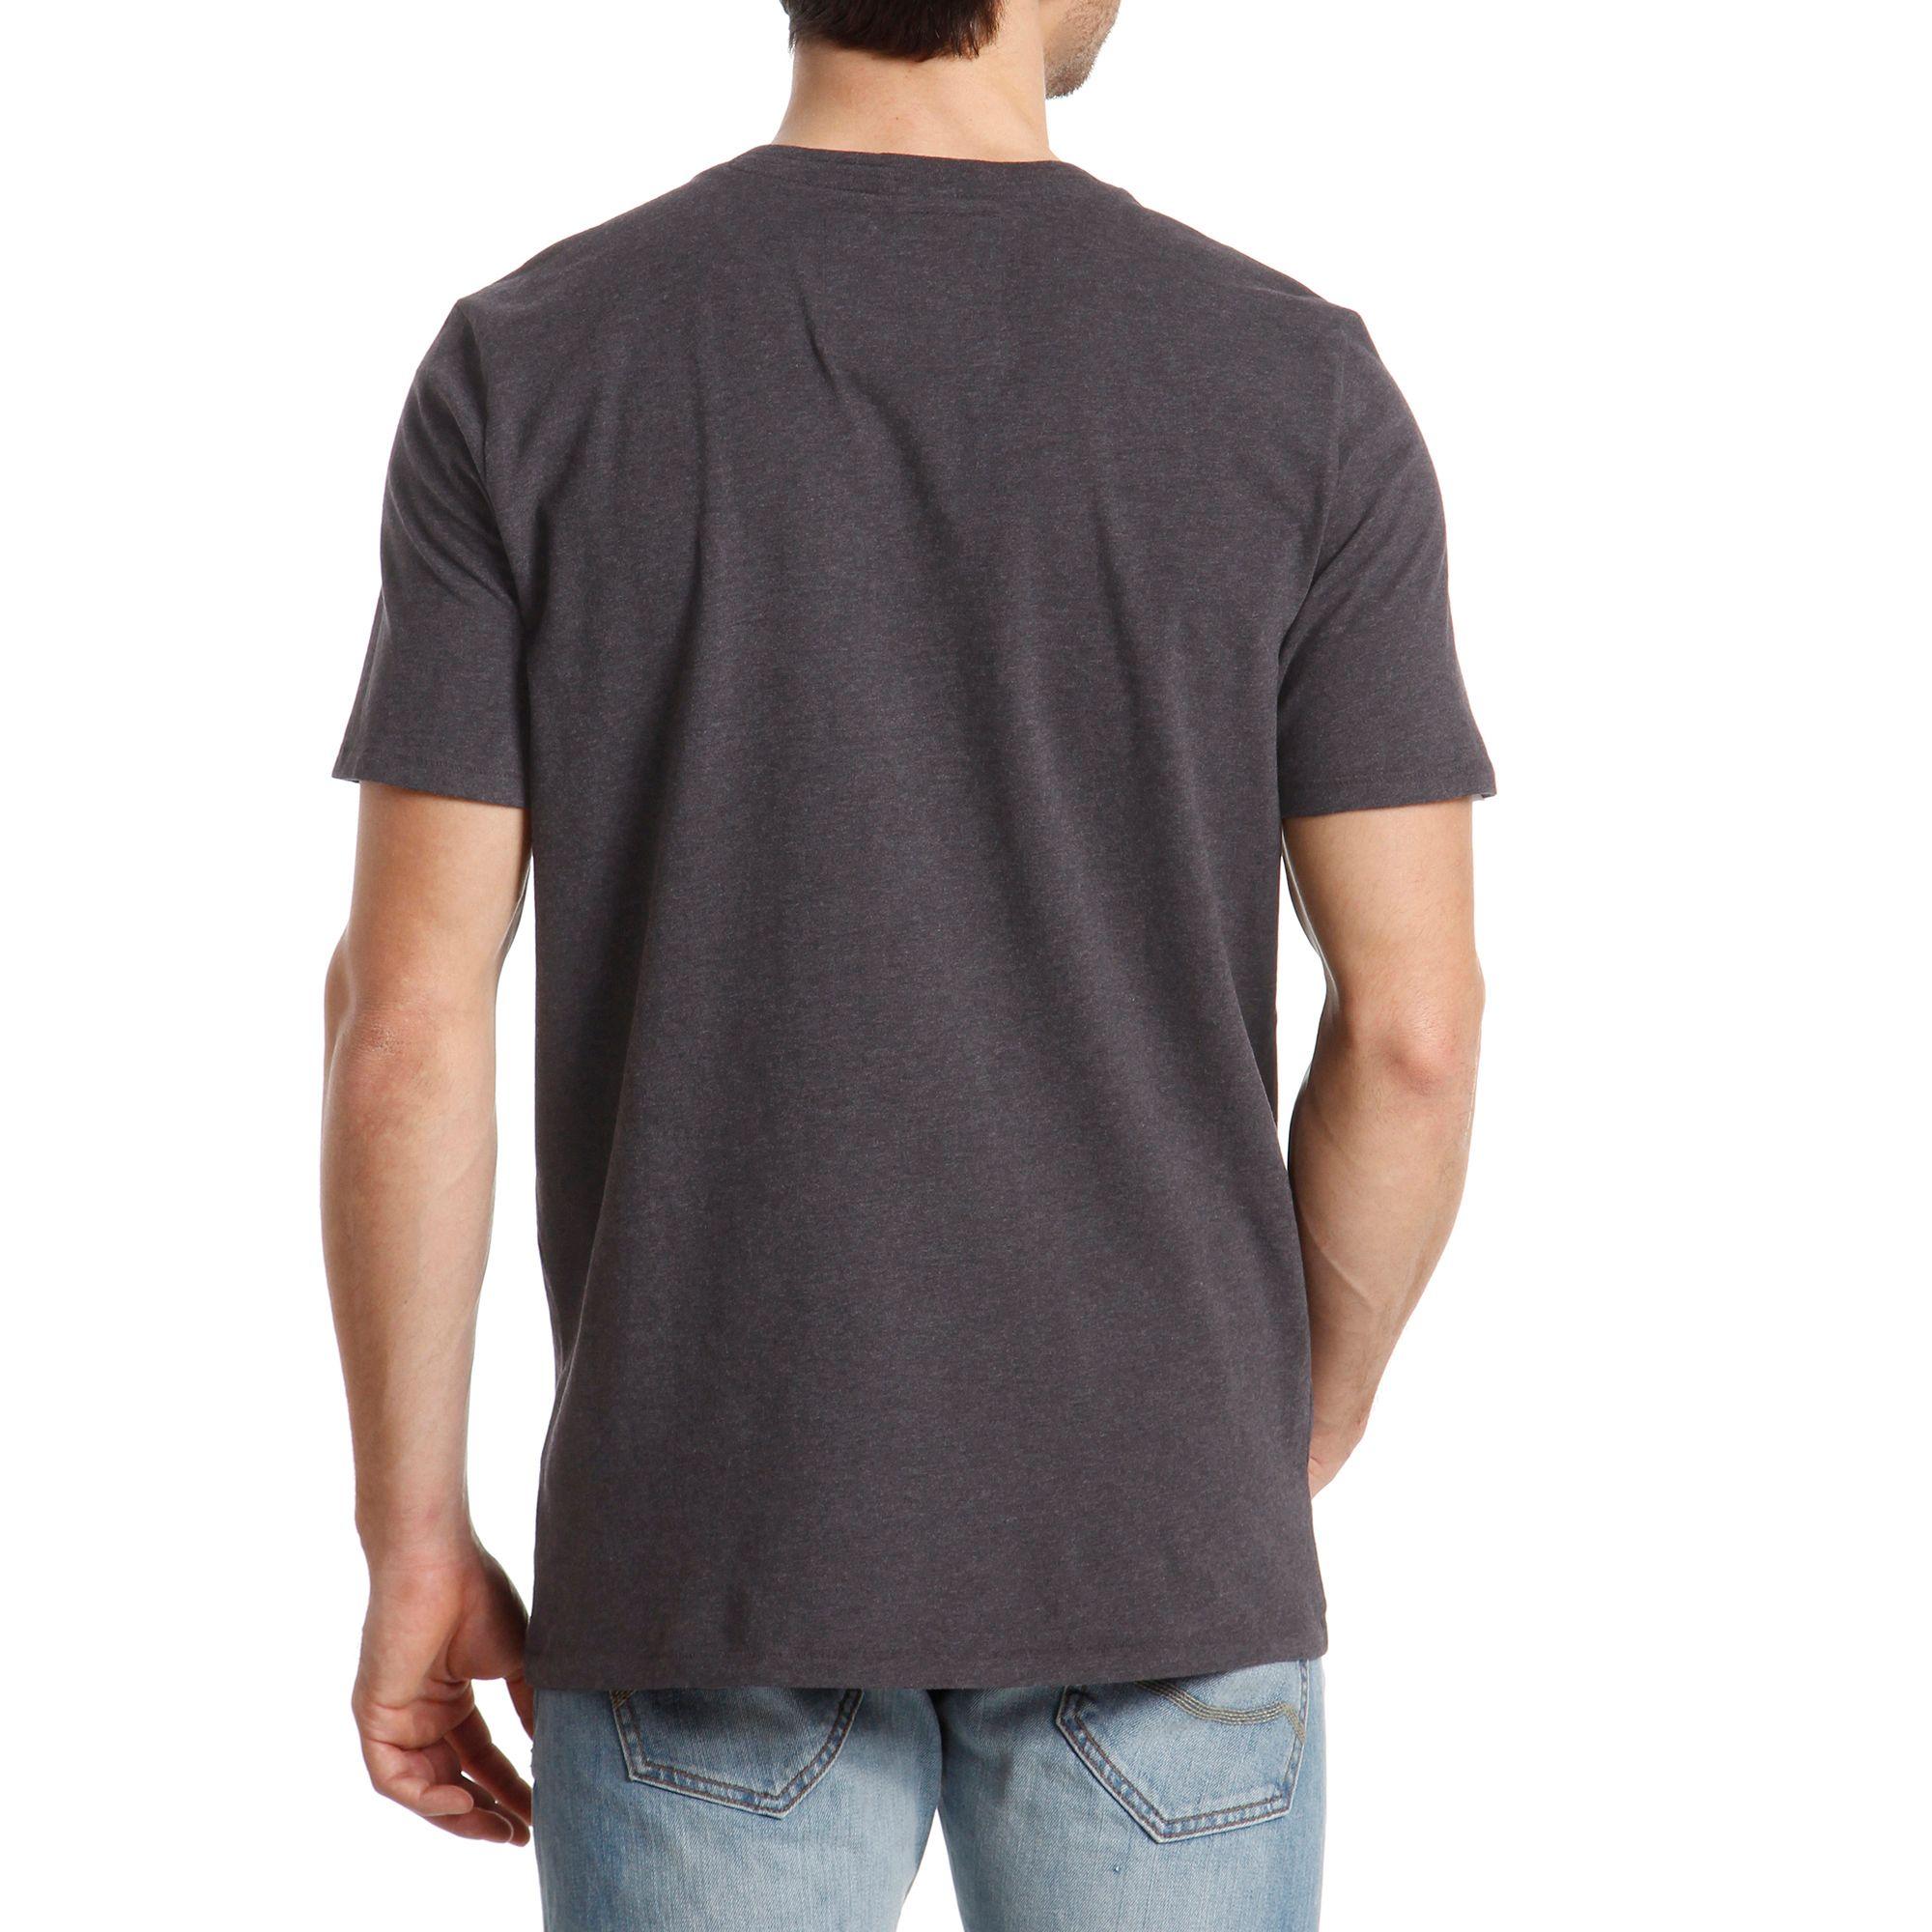 puma logo plus t shirt sport classics herren ebay. Black Bedroom Furniture Sets. Home Design Ideas